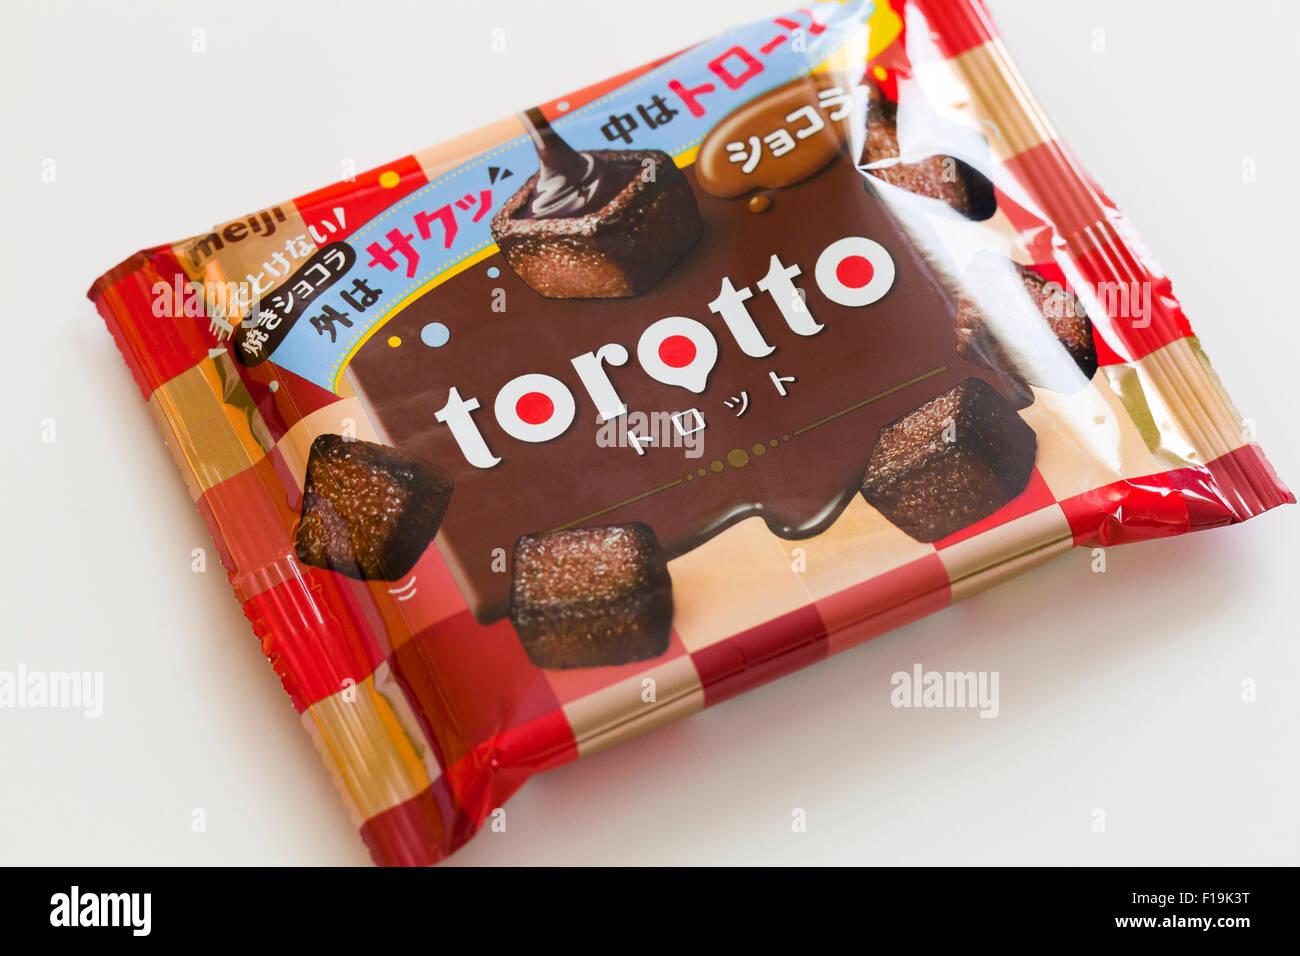 Meiji Torotto creamy chocolate package - Stock Image